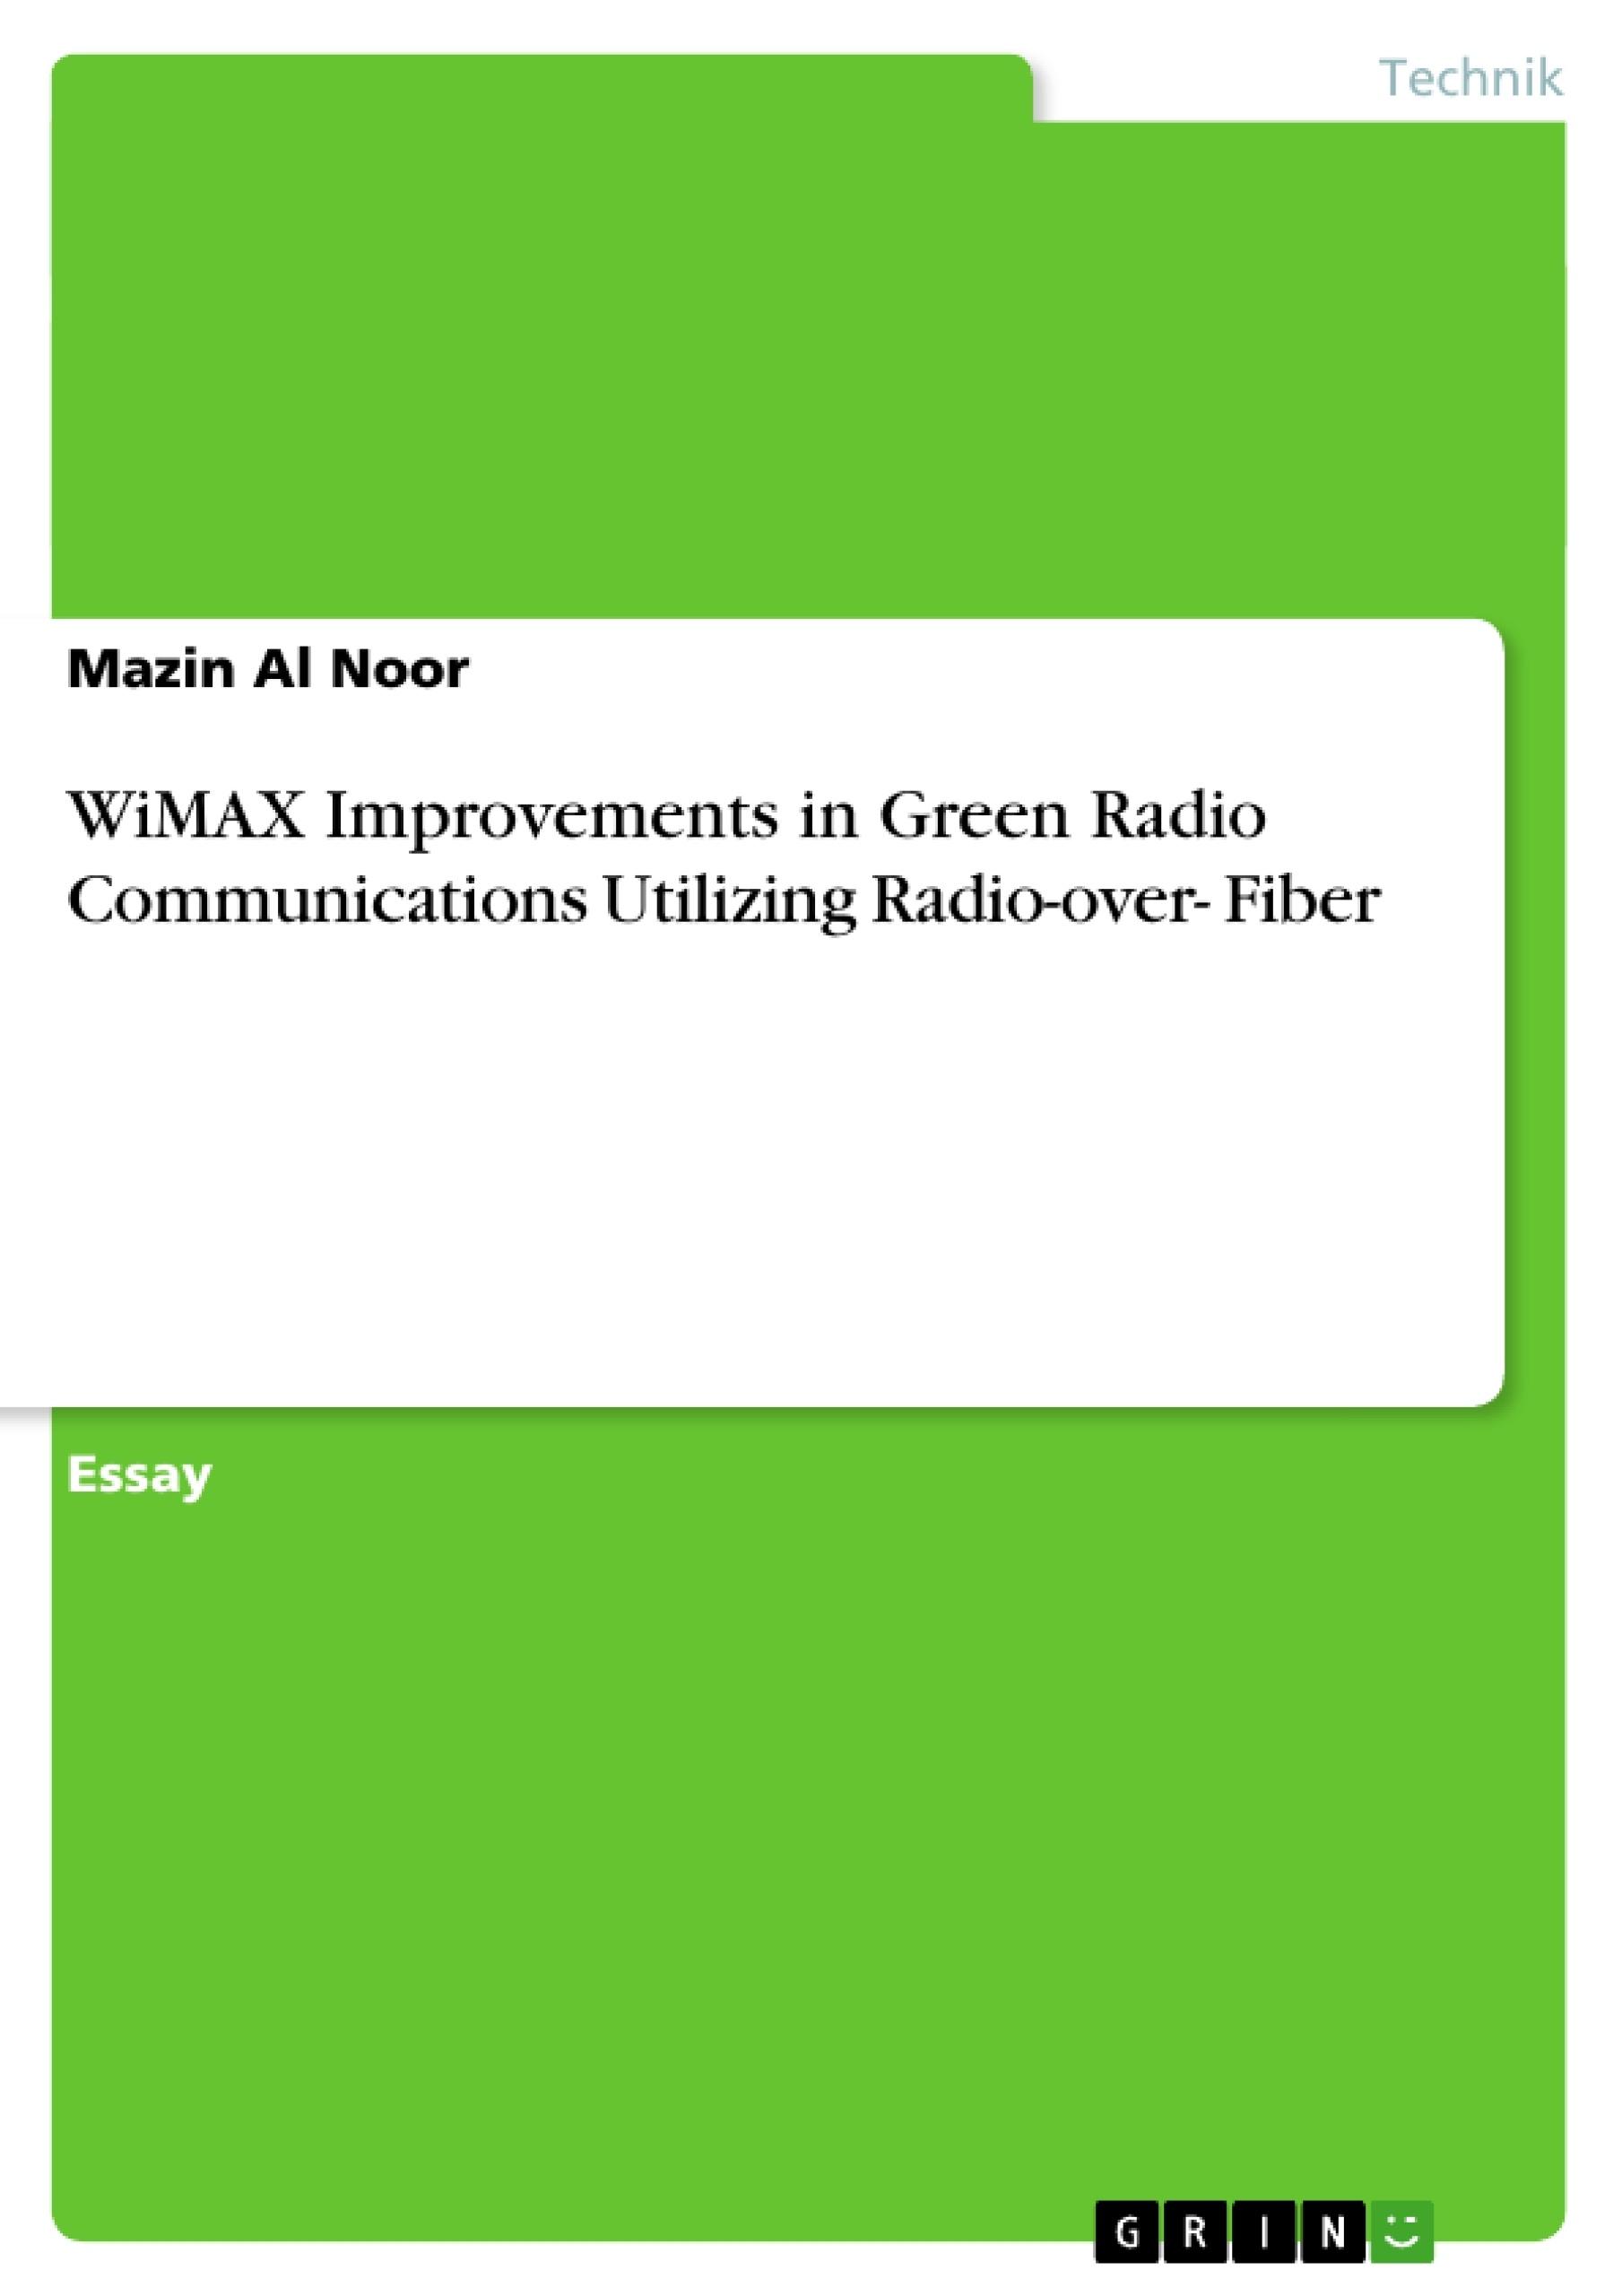 Titel: WiMAX Improvements in Green Radio Communications Utilizing Radio-over- Fiber